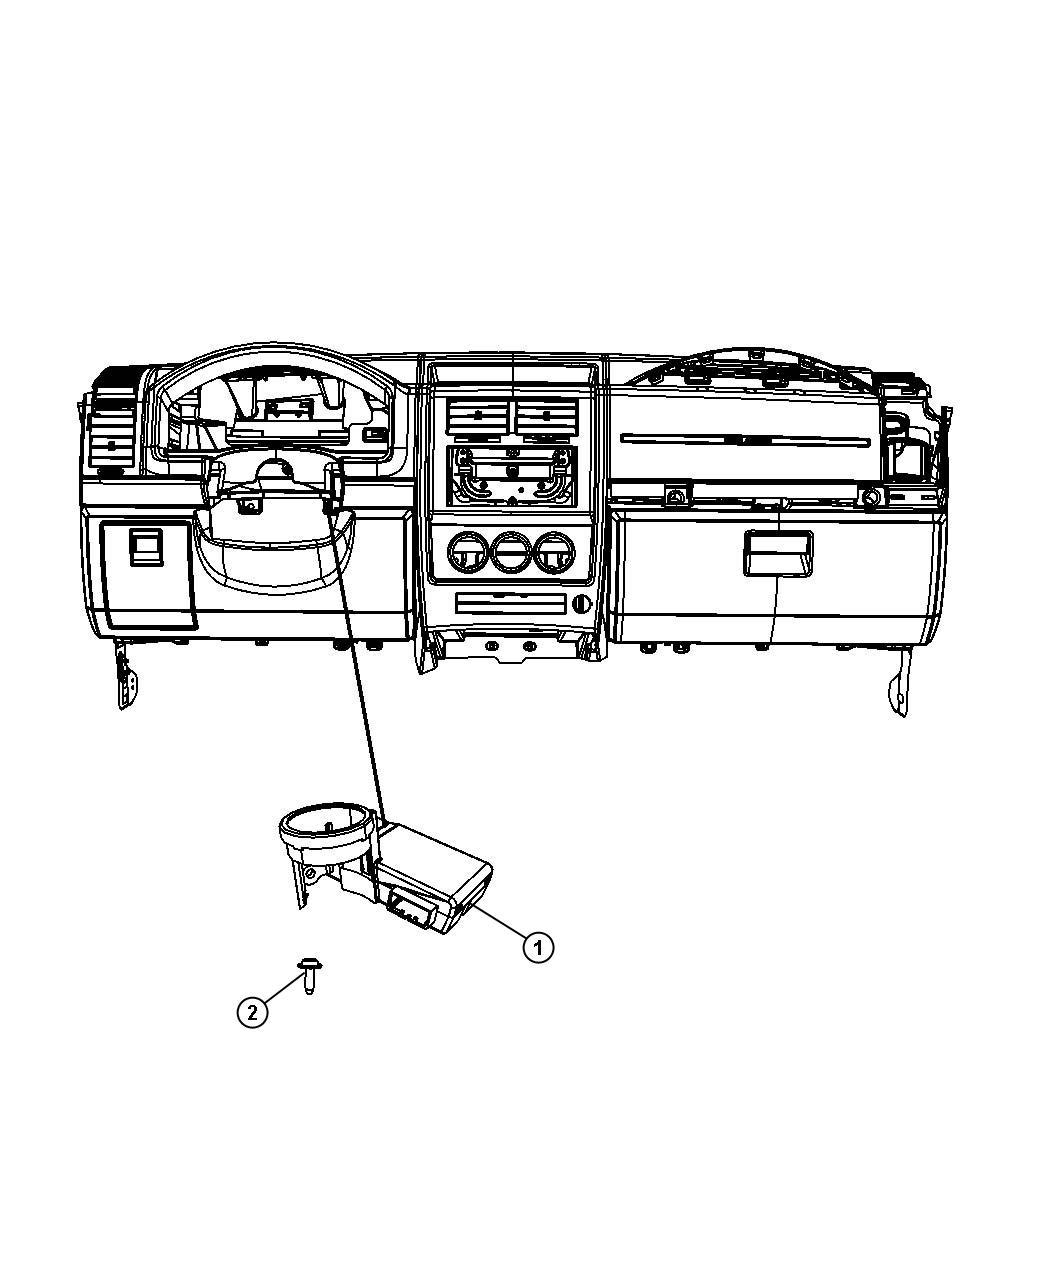 Jeep Liberty Receiver Control Module